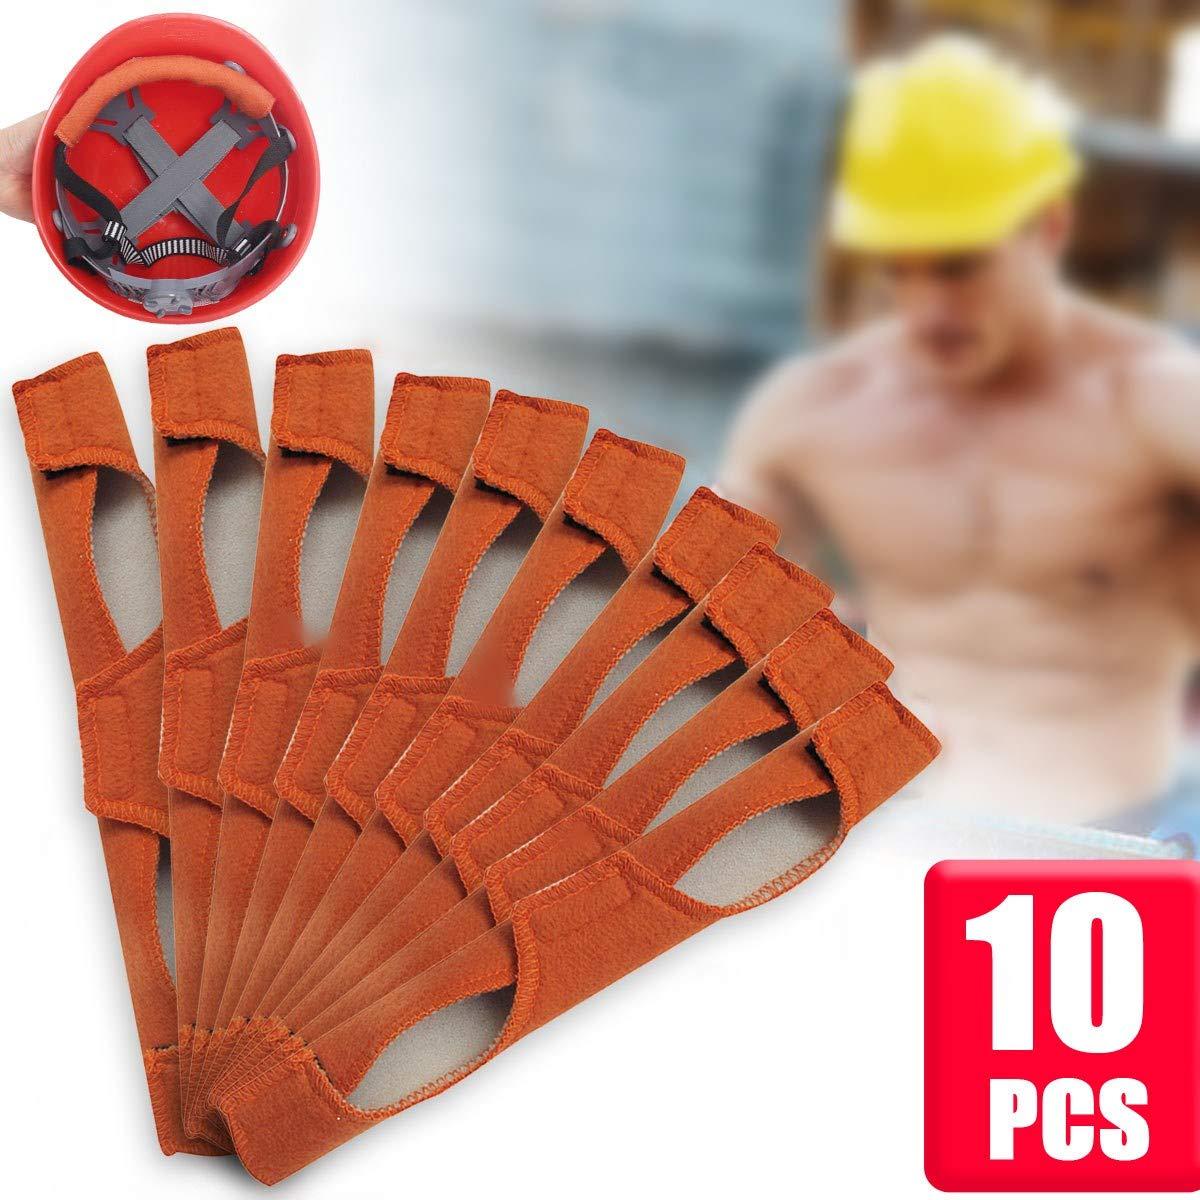 HAPYLY 10PCS Sweatband welding Brown Sweatband Hard Hat Headbands for Welding Helmets,Cycle Ricing,Hard Hat 25x9.5cm